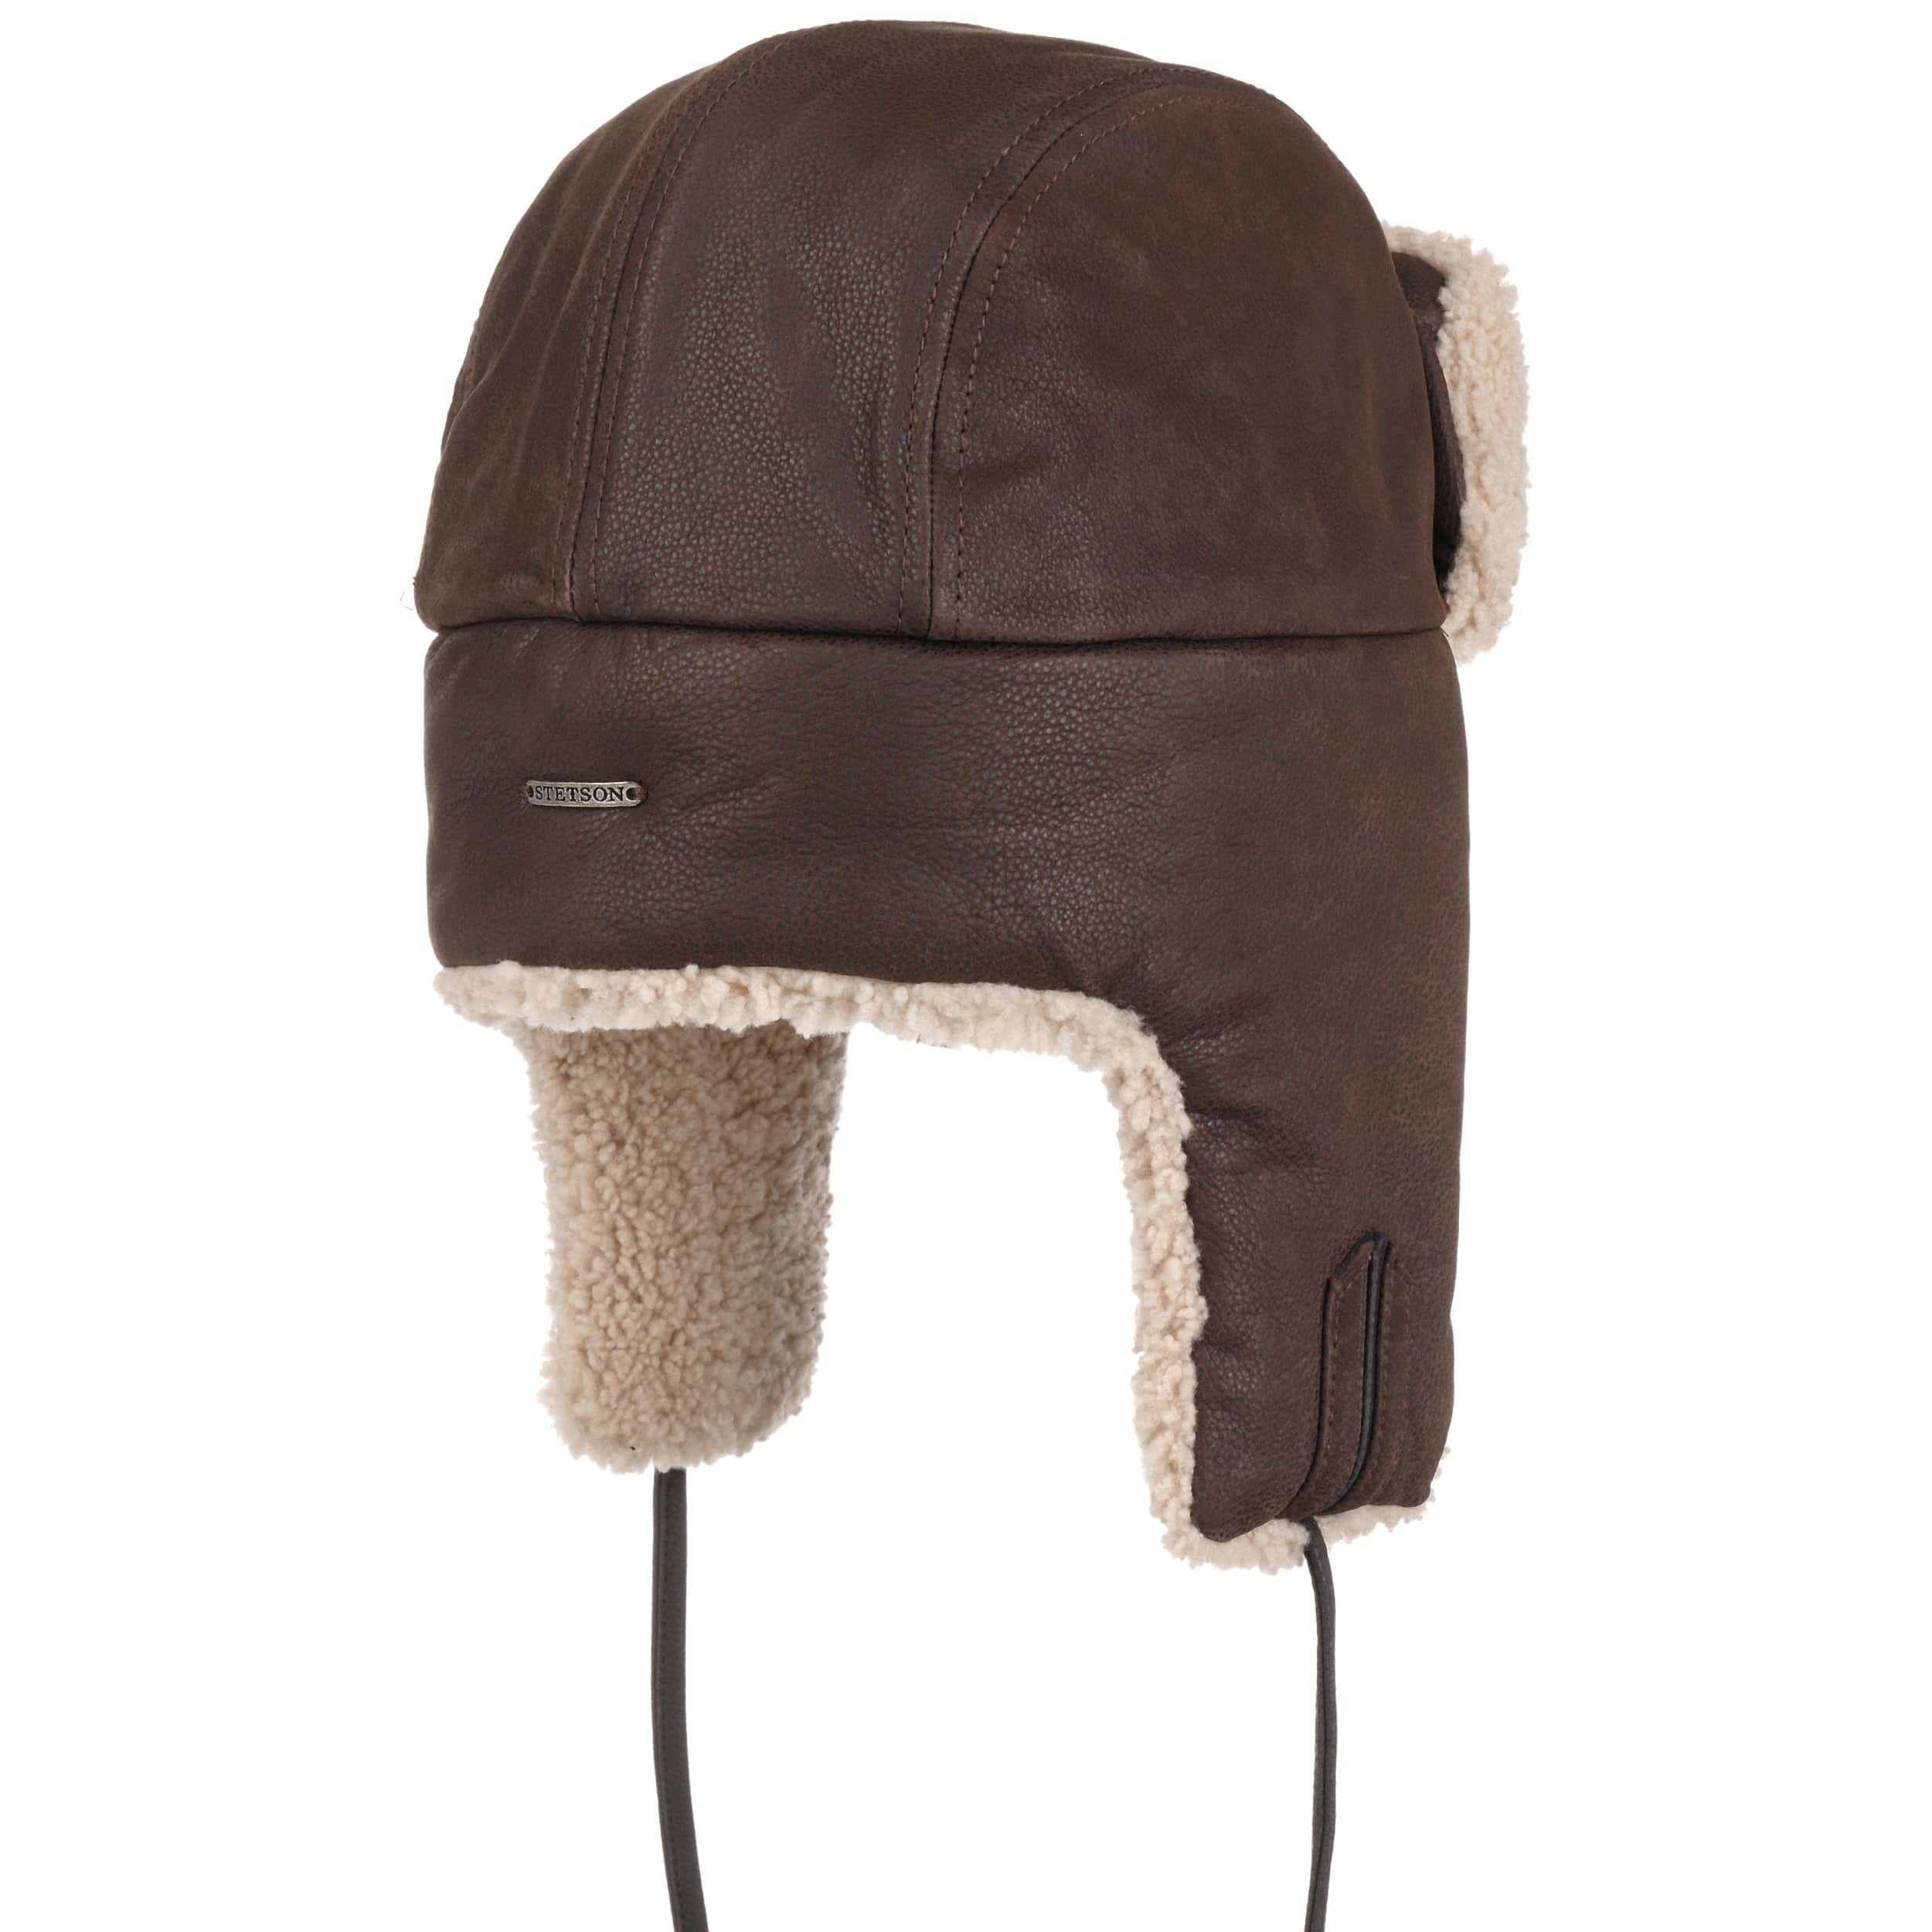 ... Payson Chevrette Aviator Hat by Stetson - brown 3 ... b27aebdc312